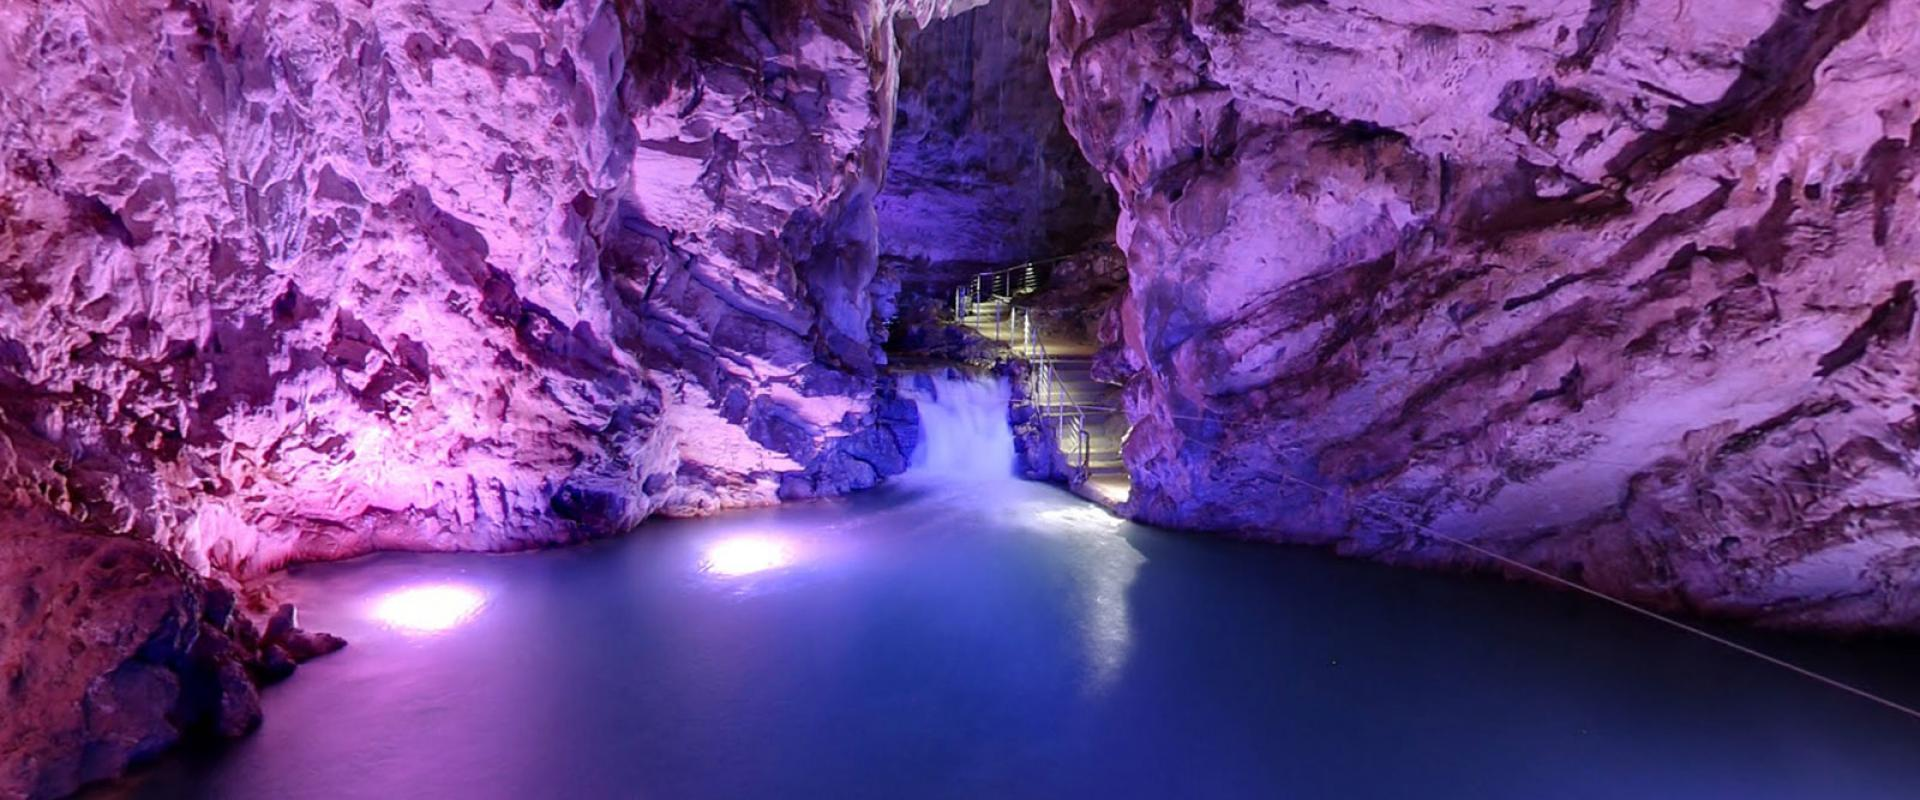 Visit the Pertosa caves